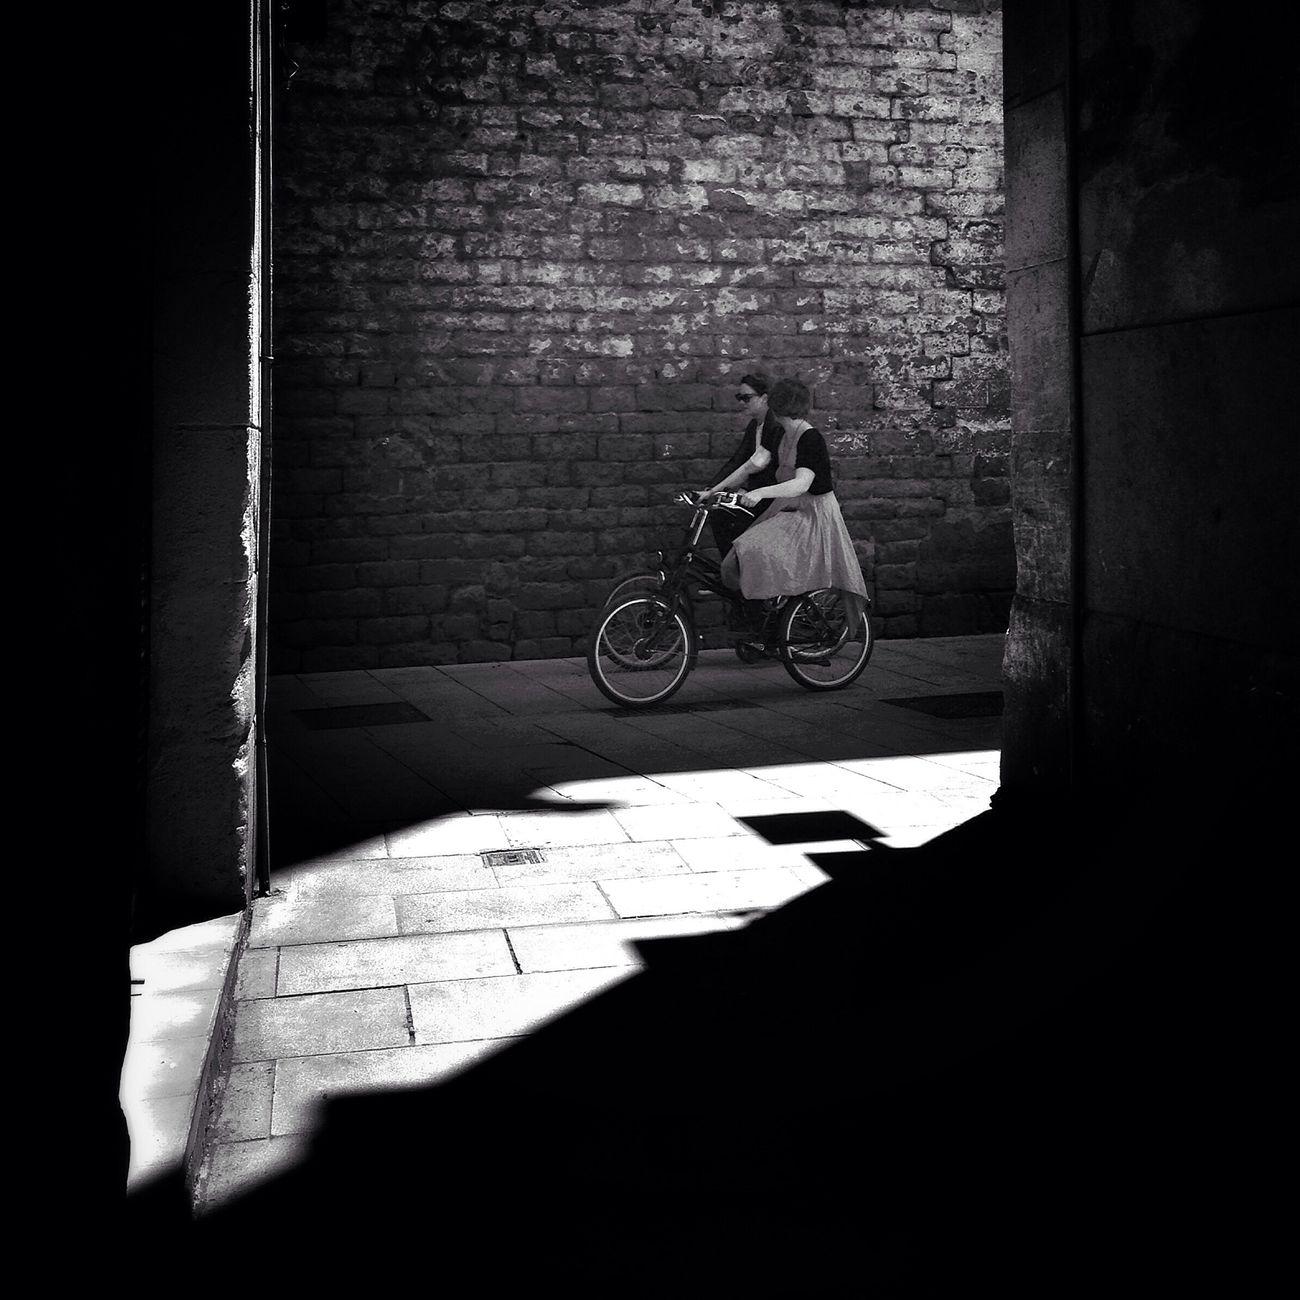 Street Streetphotography Blackandwhite Streetphoto_bw